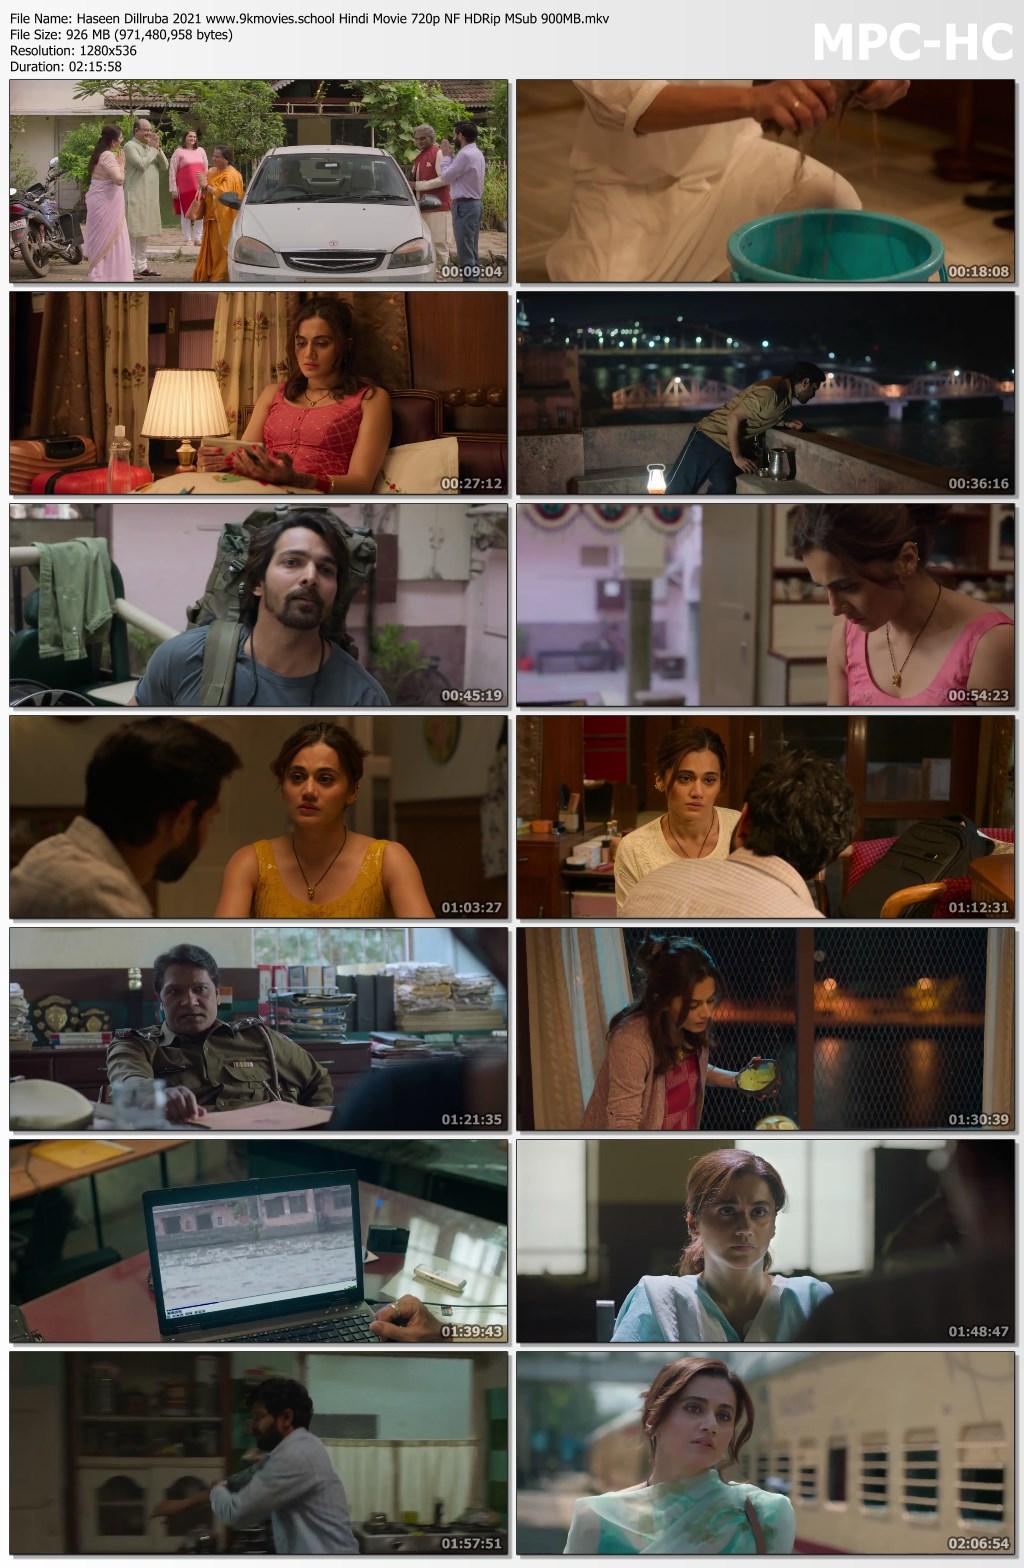 Haseen Dillruba 2021 screenshot HDMoviesFair